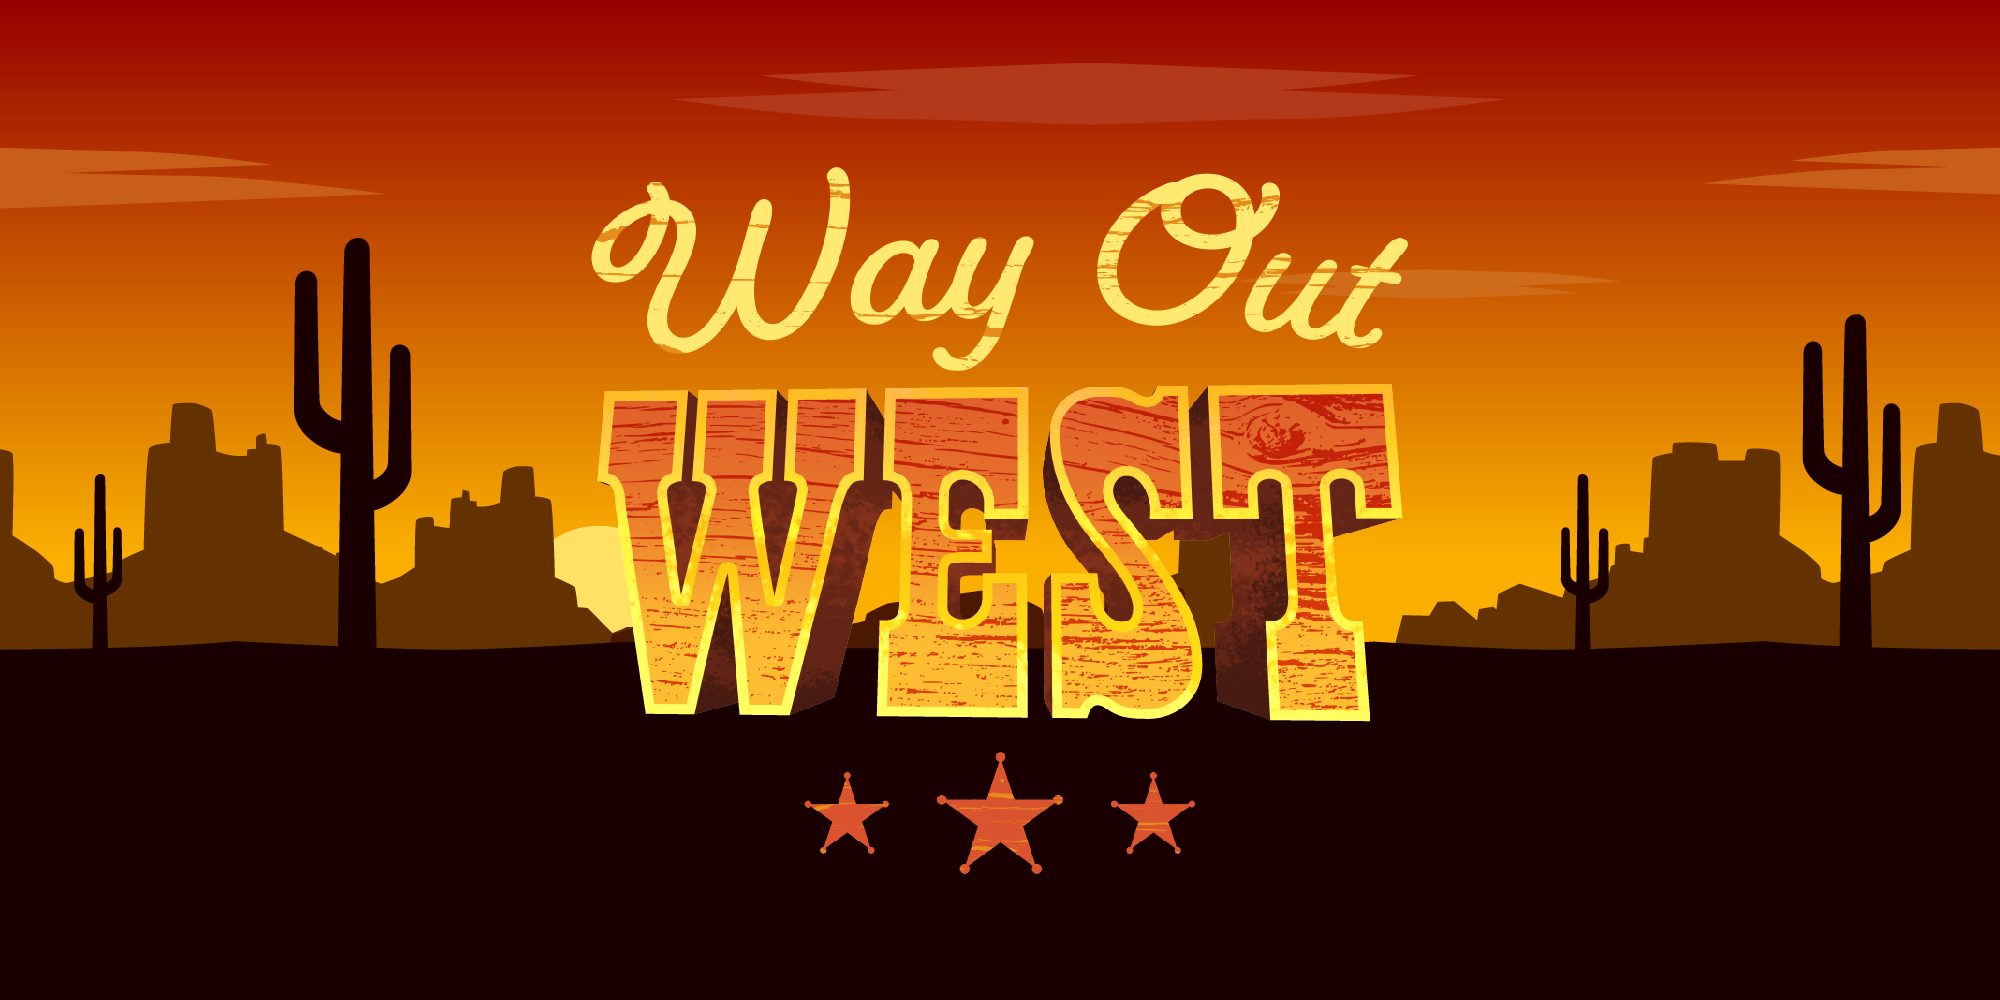 Gratis Tatuering Way Out West 2019